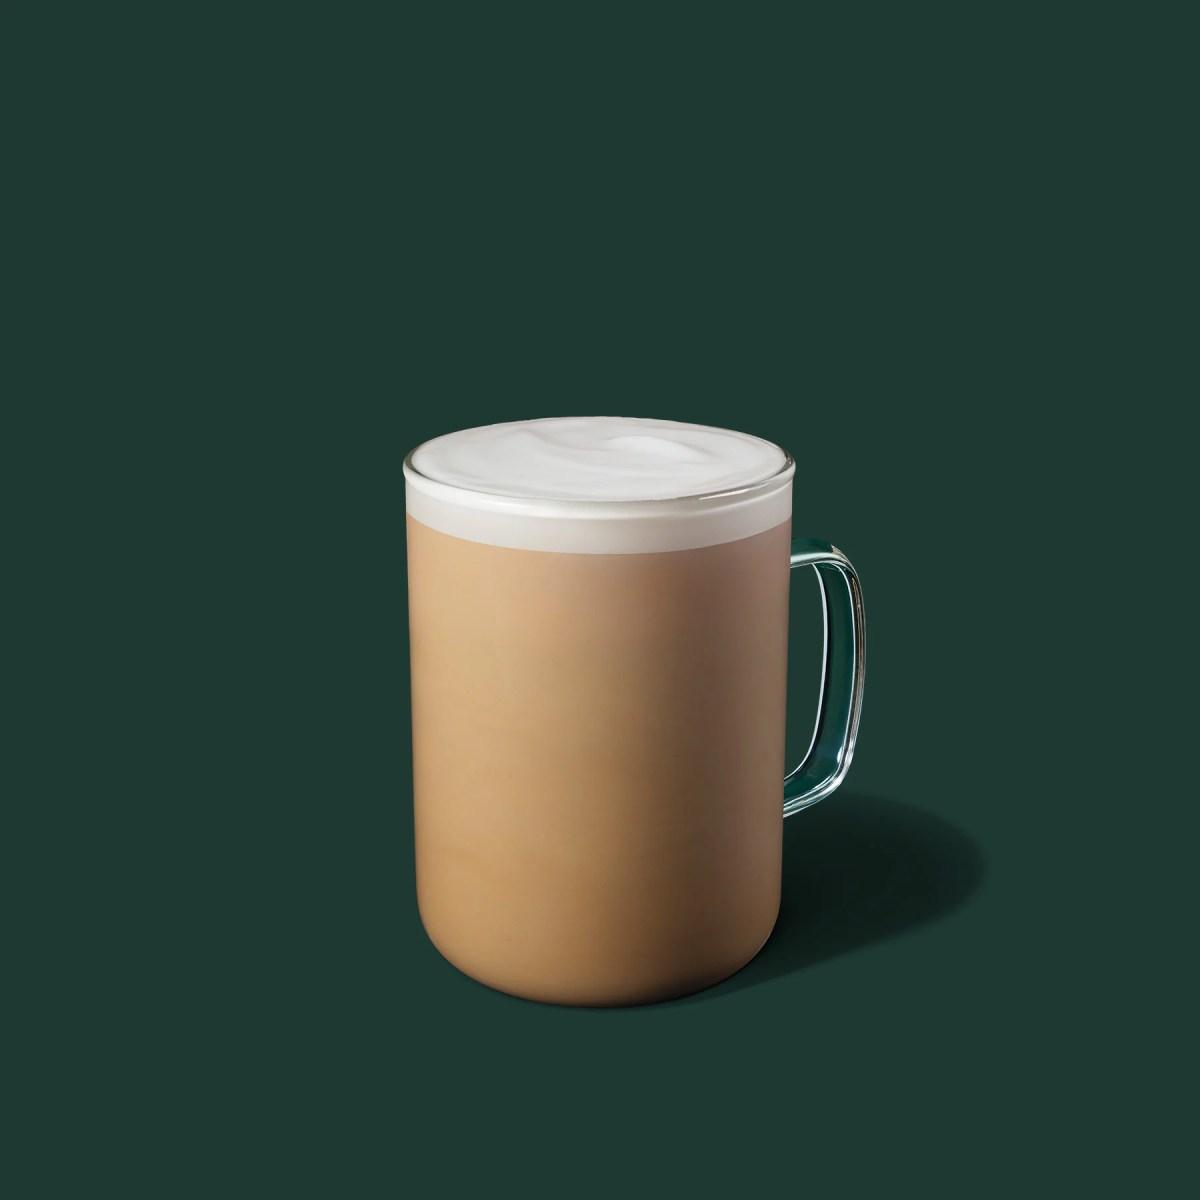 Chai Latte: Starbucks Coffee Company